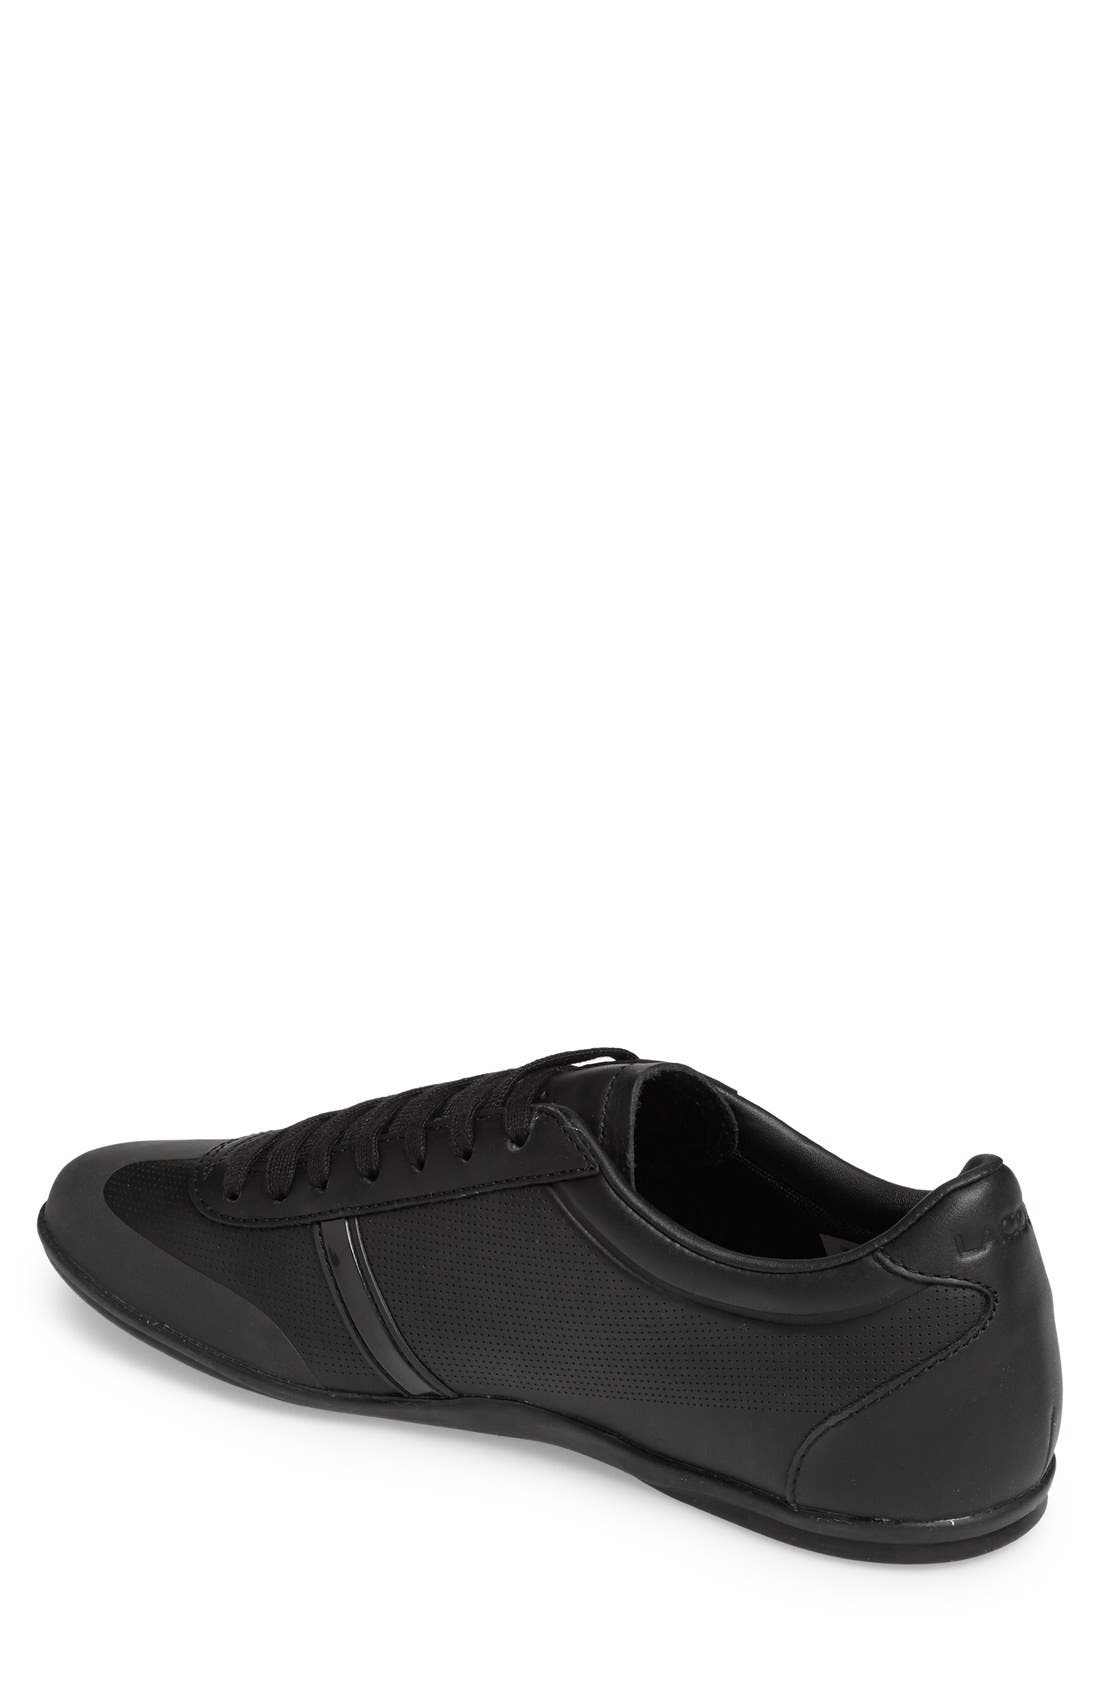 Mokara Sneaker,                             Alternate thumbnail 2, color,                             008